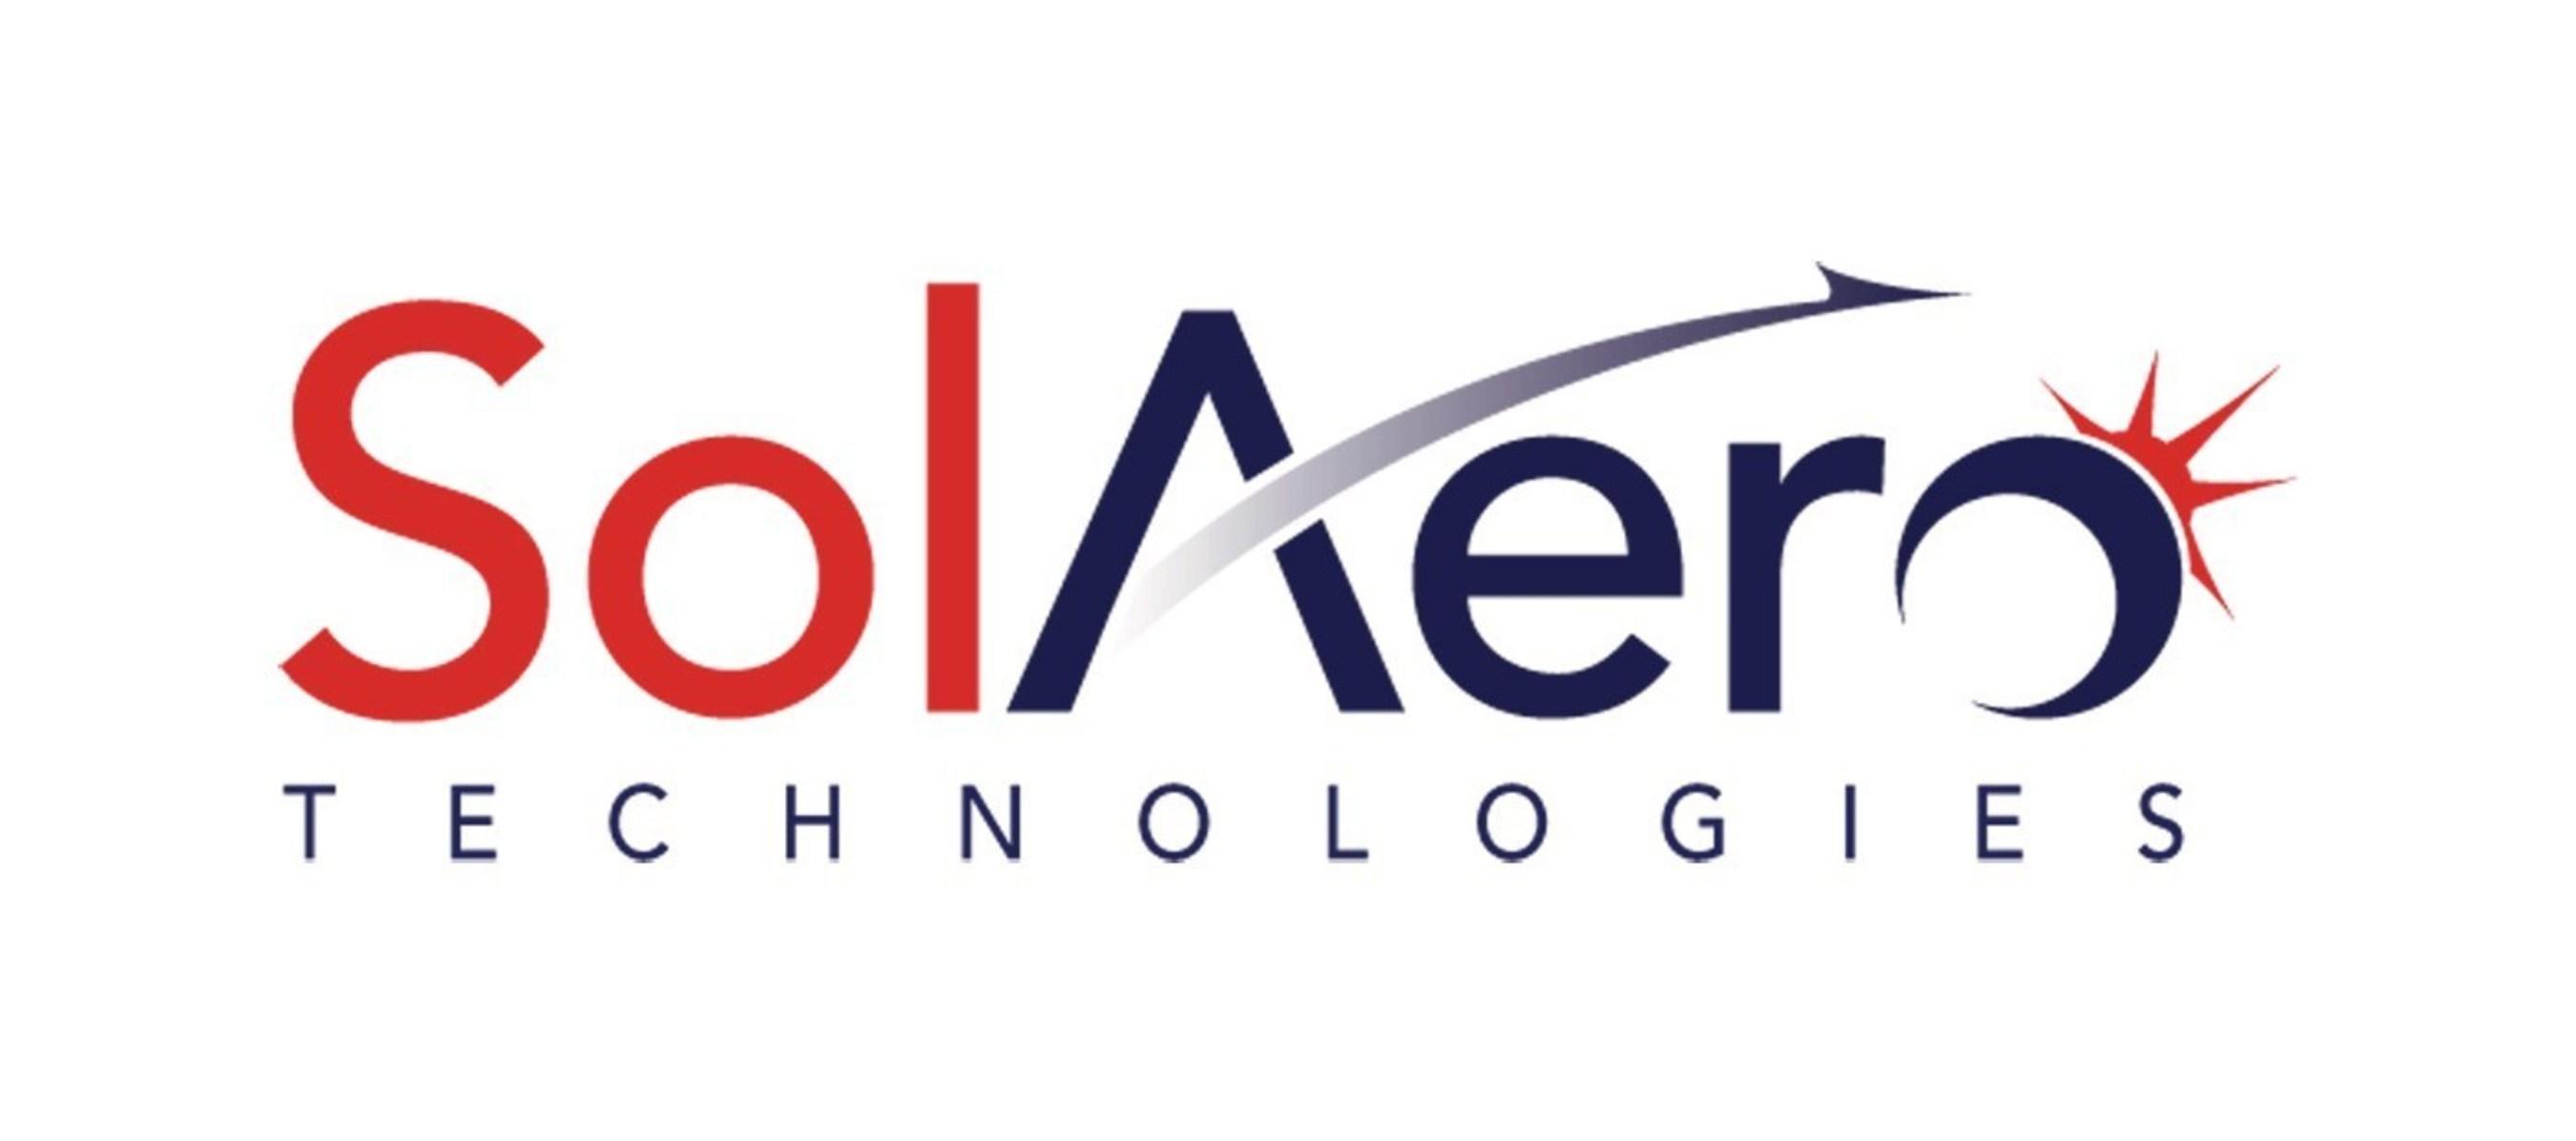 SolAero Technologies Acquires Vanguard Space Technologies